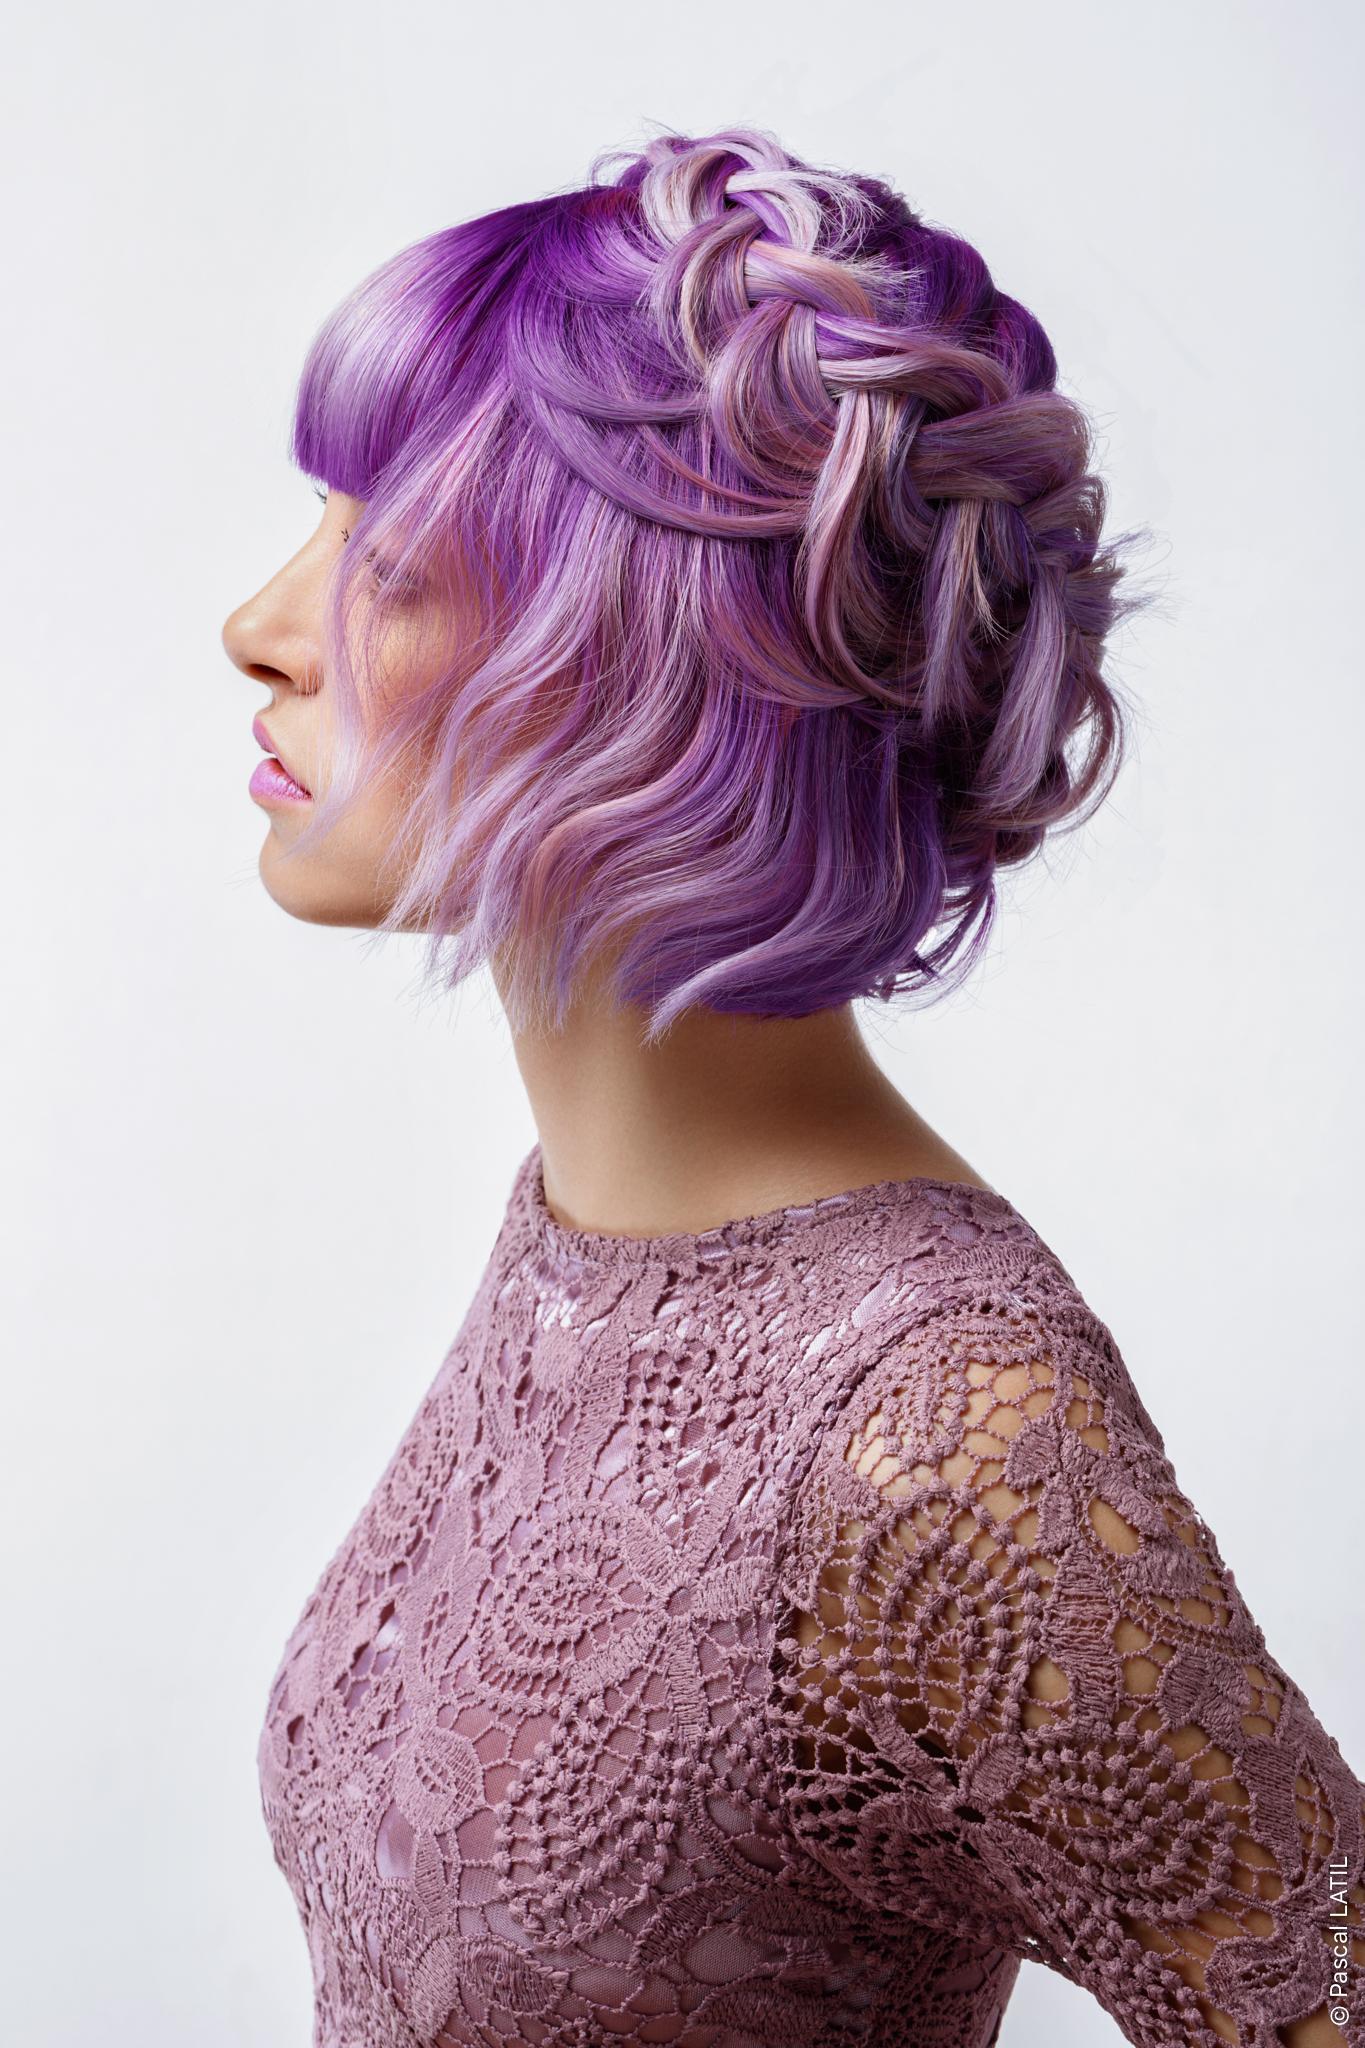 Photo©Pascal_LATIL_-Hair©Laurie_Cesari_-_Web_-_5